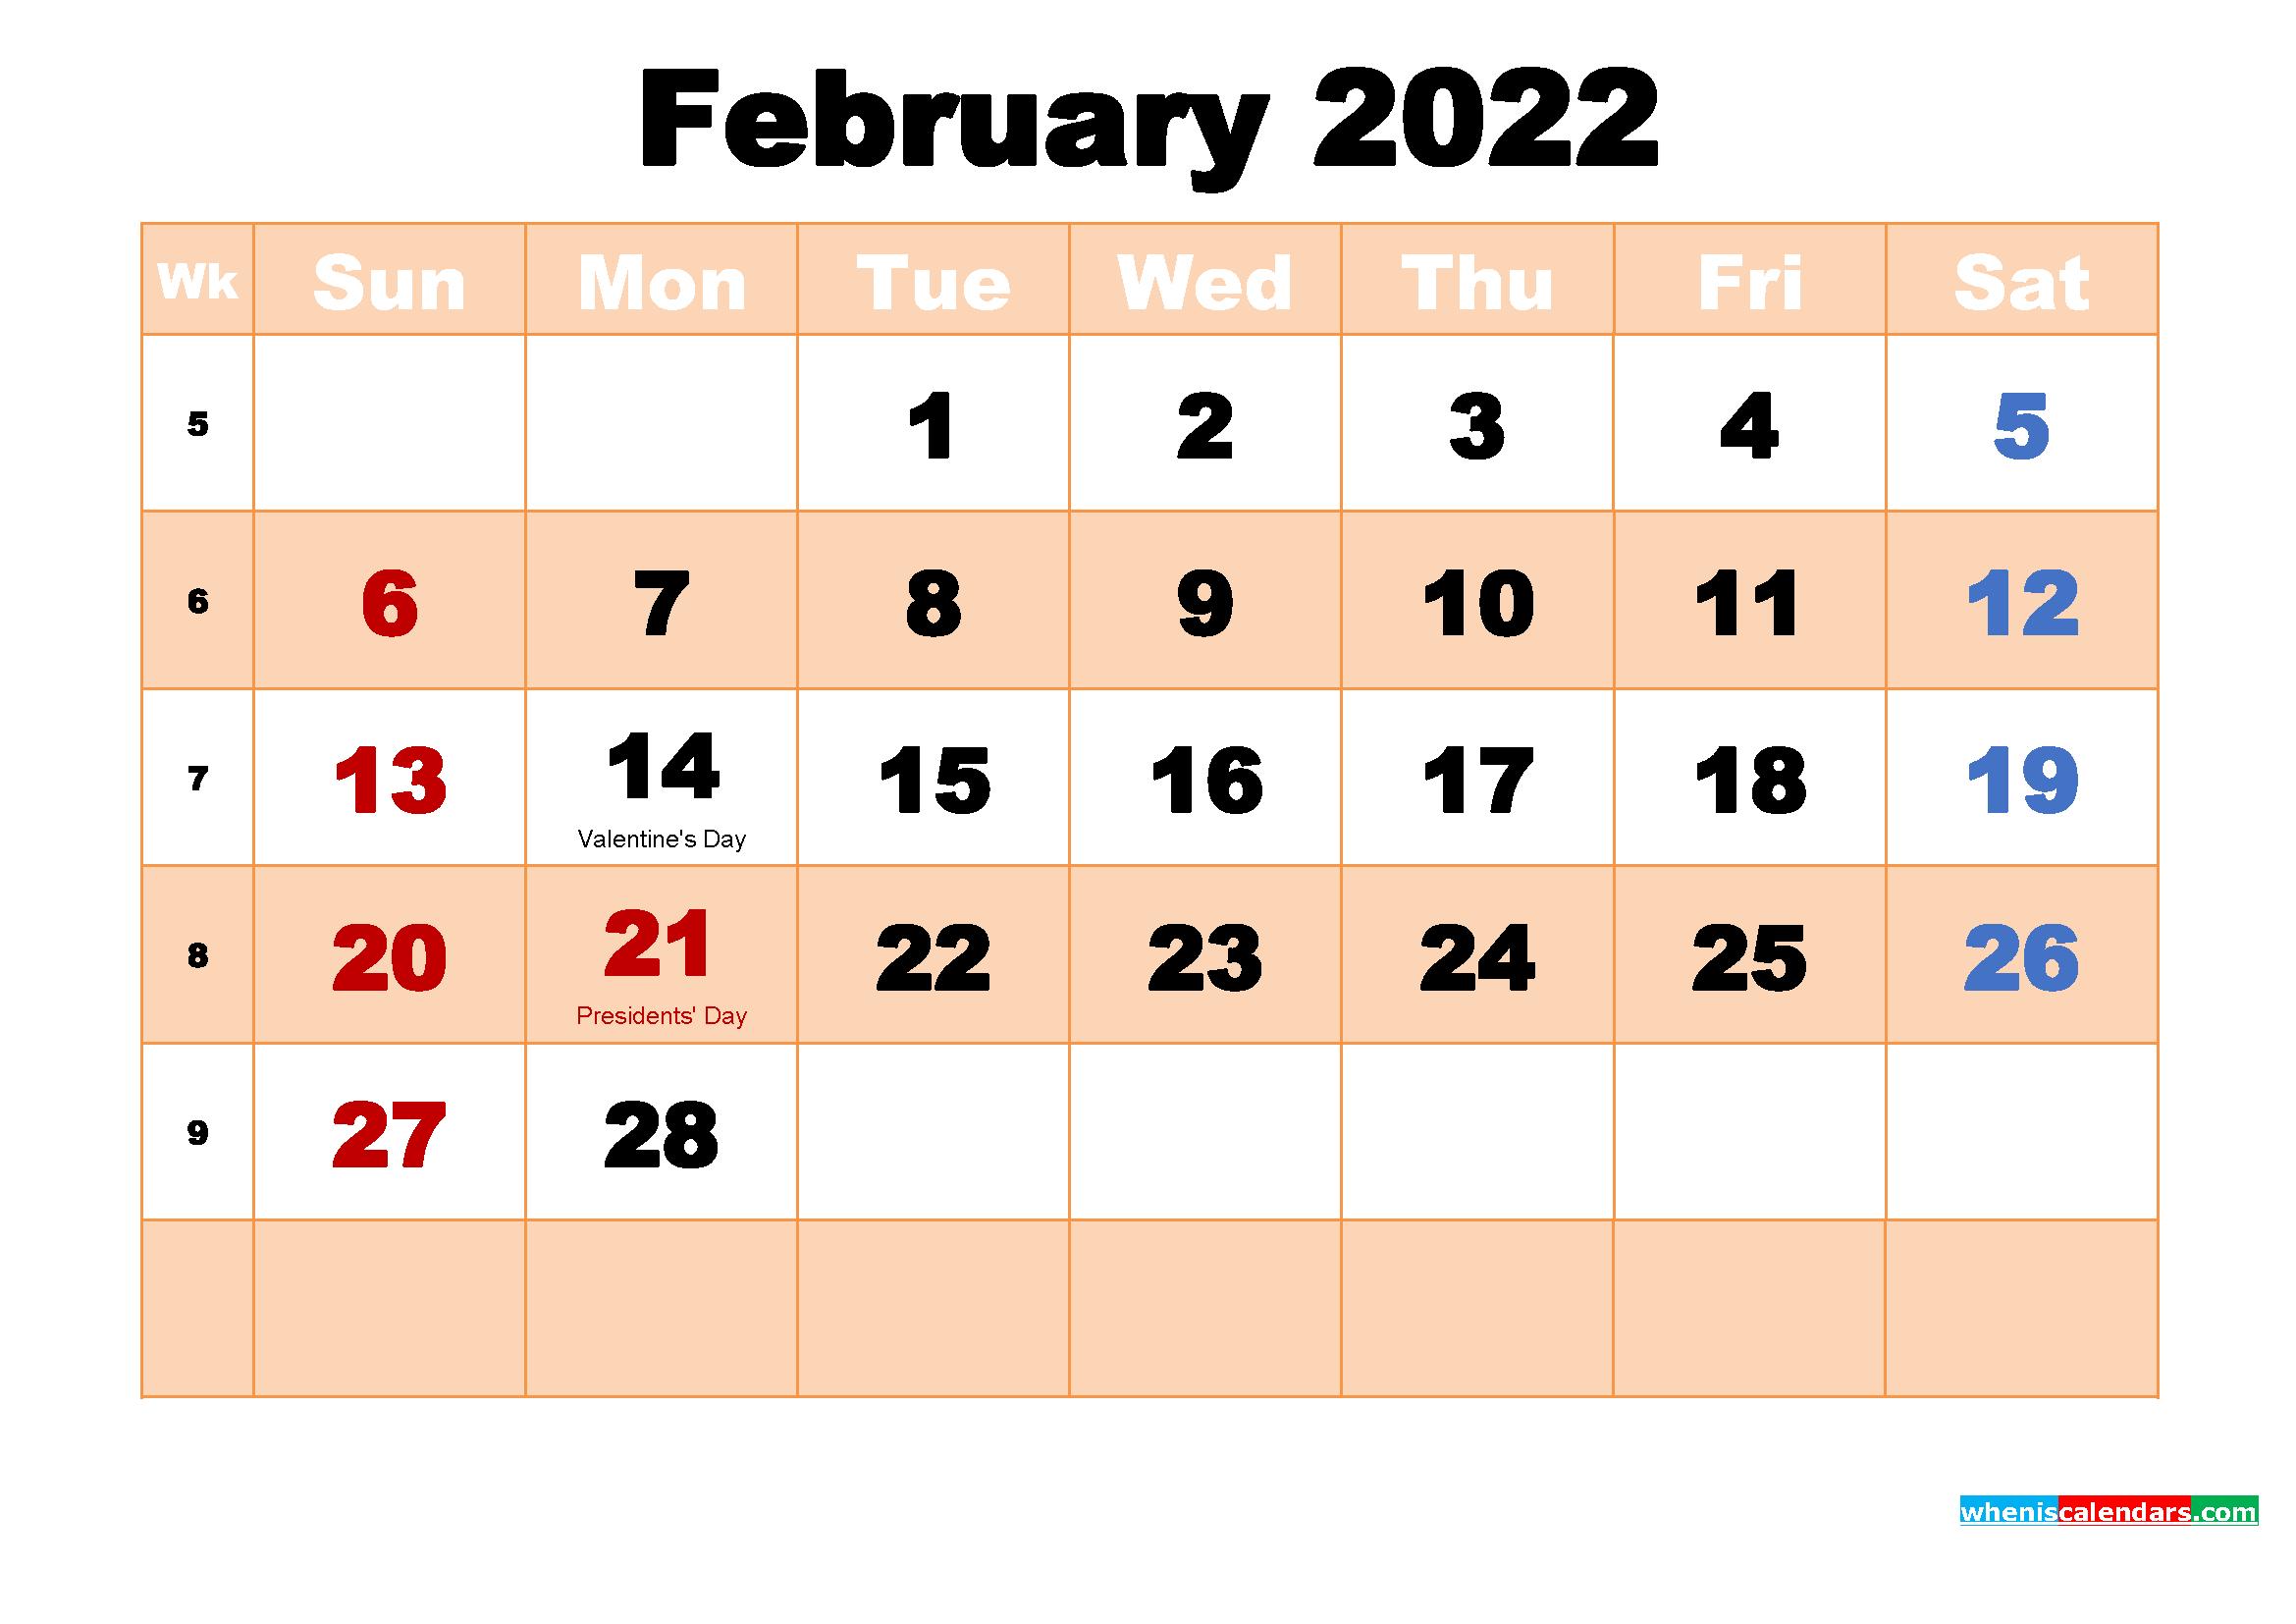 Free Printable February 2022 Calendar With Holidays With Printable Calendar February 2022